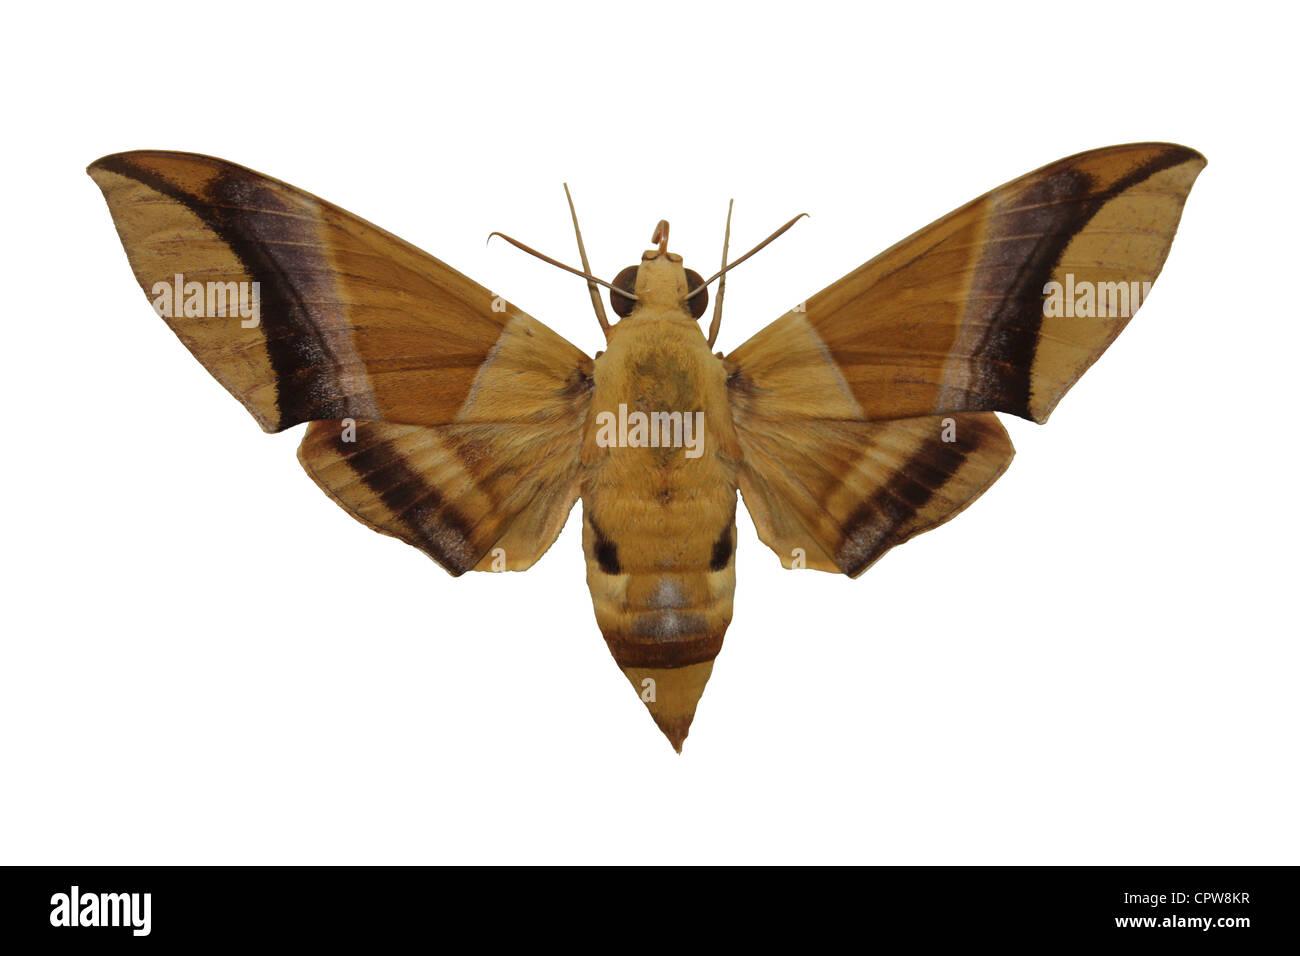 Hawk Moth Cut-out Stock Photo